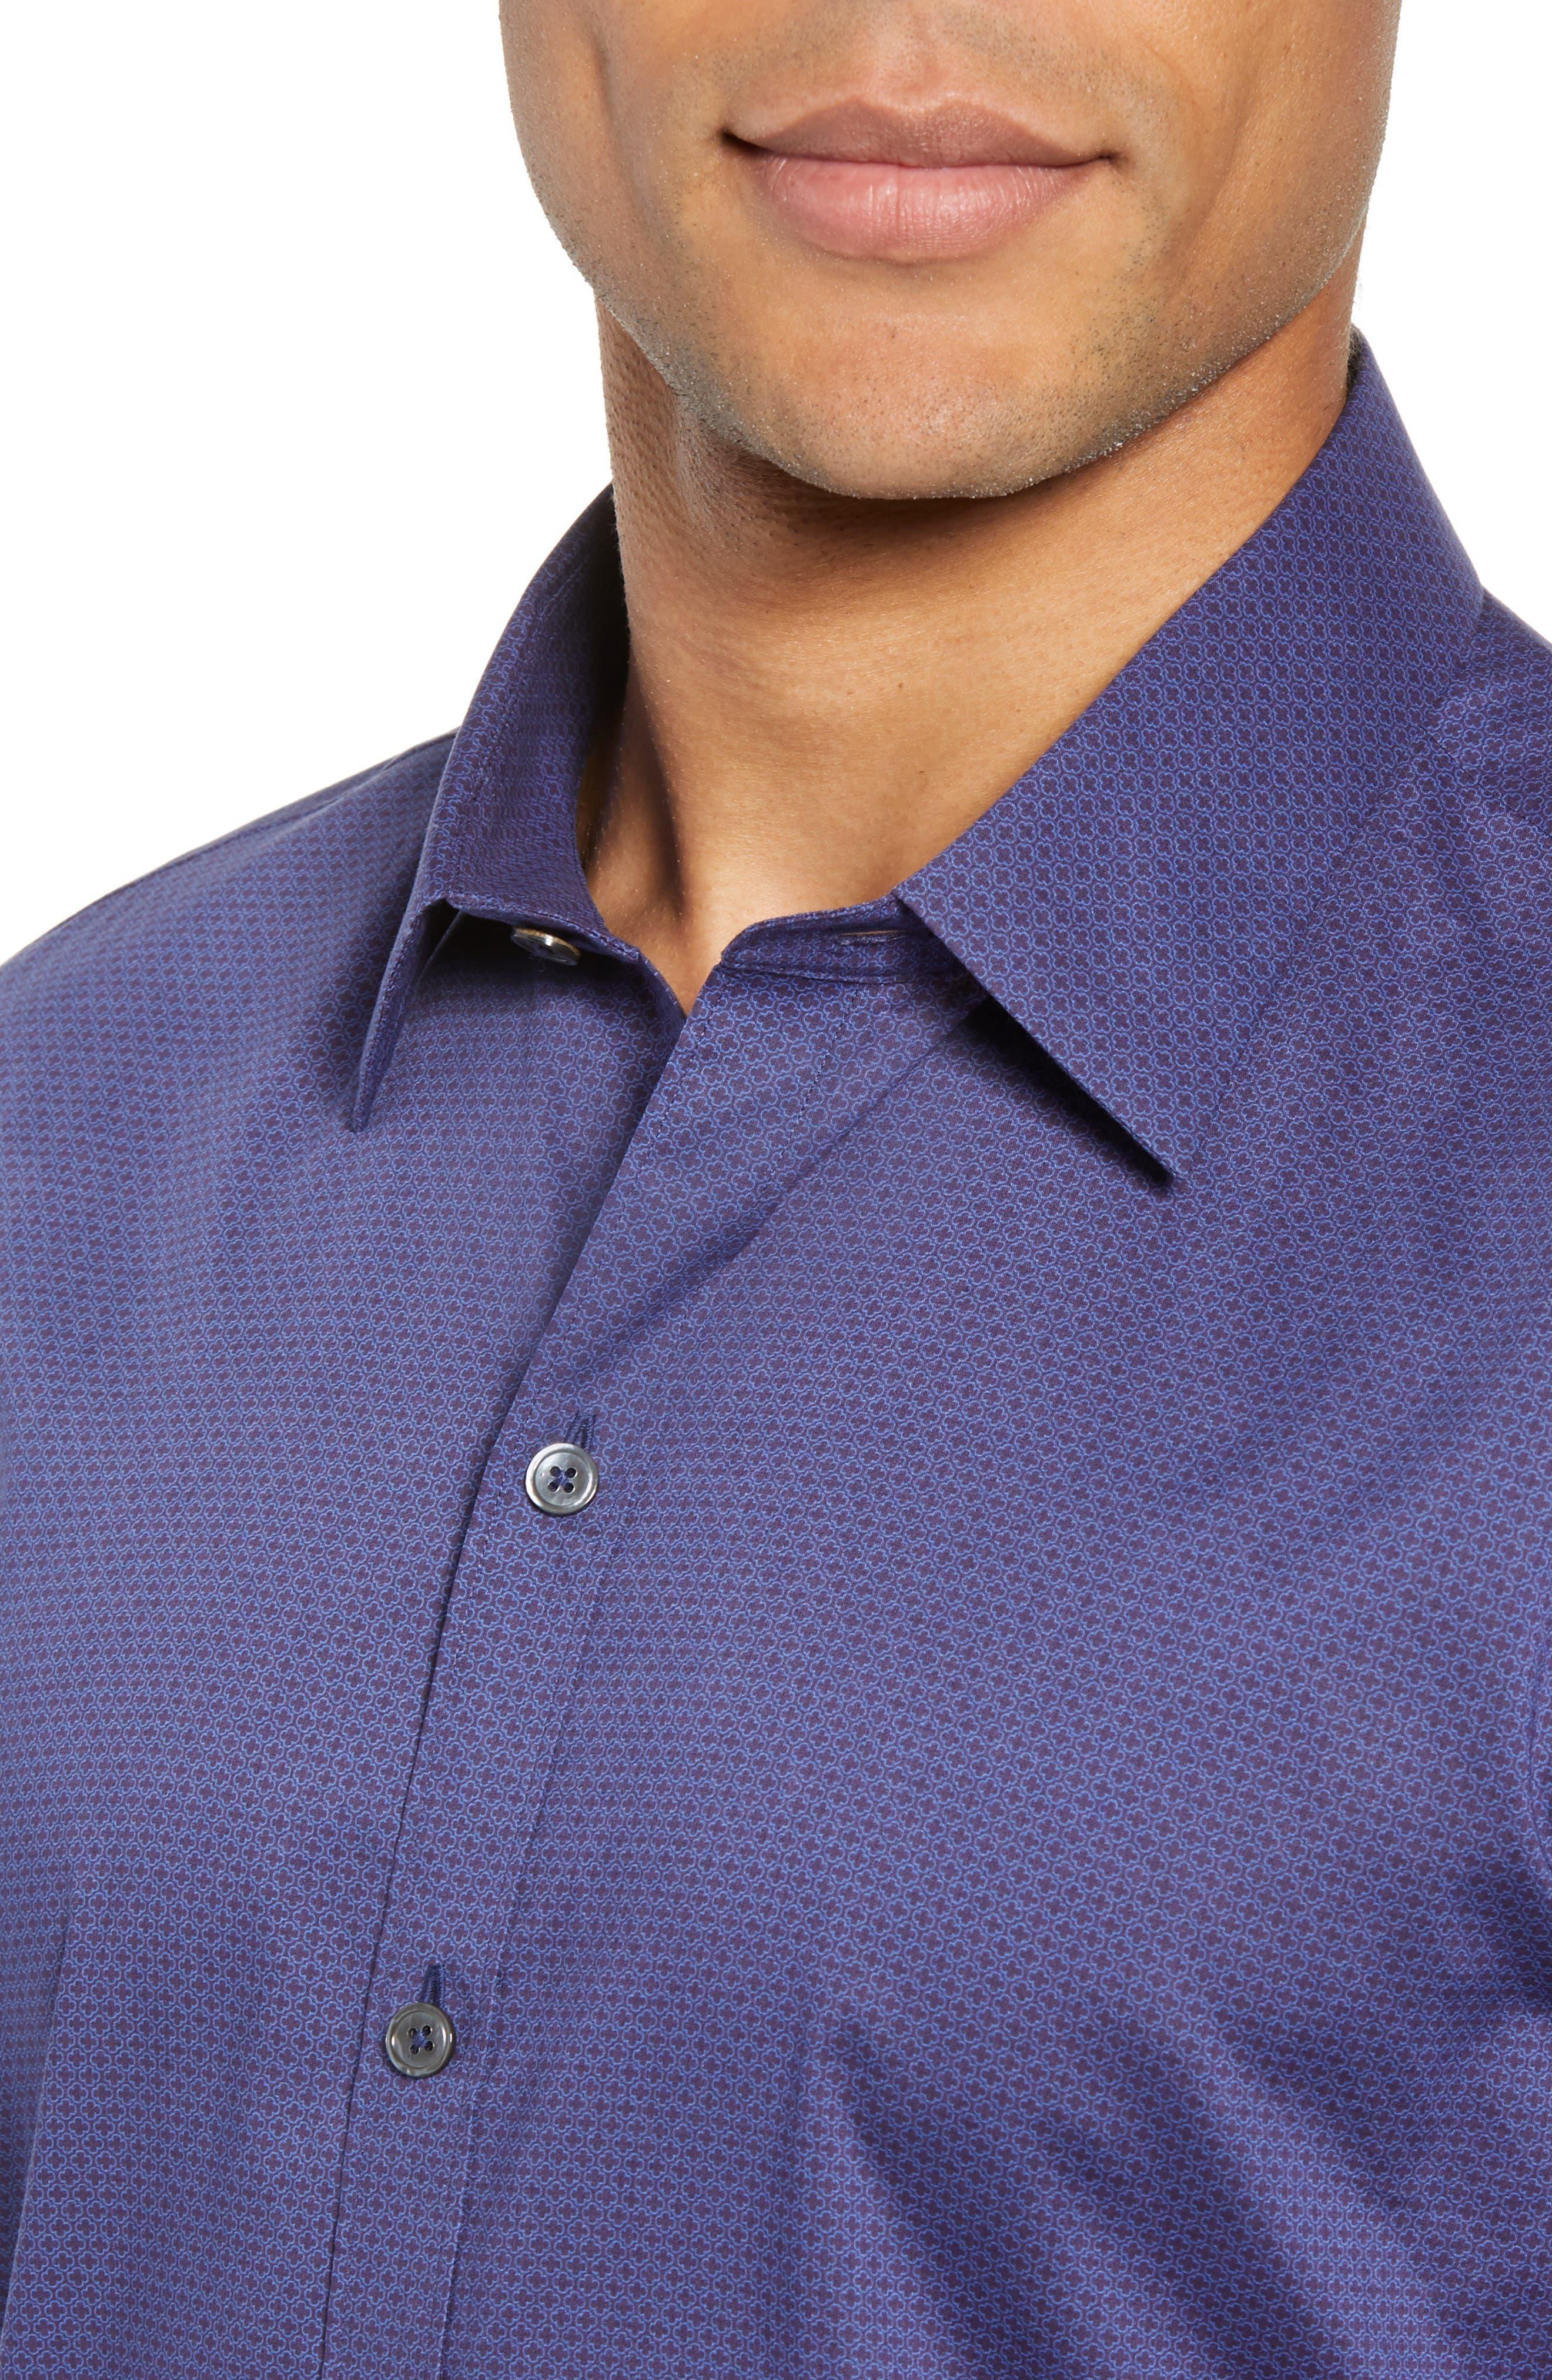 Avellan Regular Fit Sport Shirt,                             Alternate thumbnail 4, color,                             BLUE